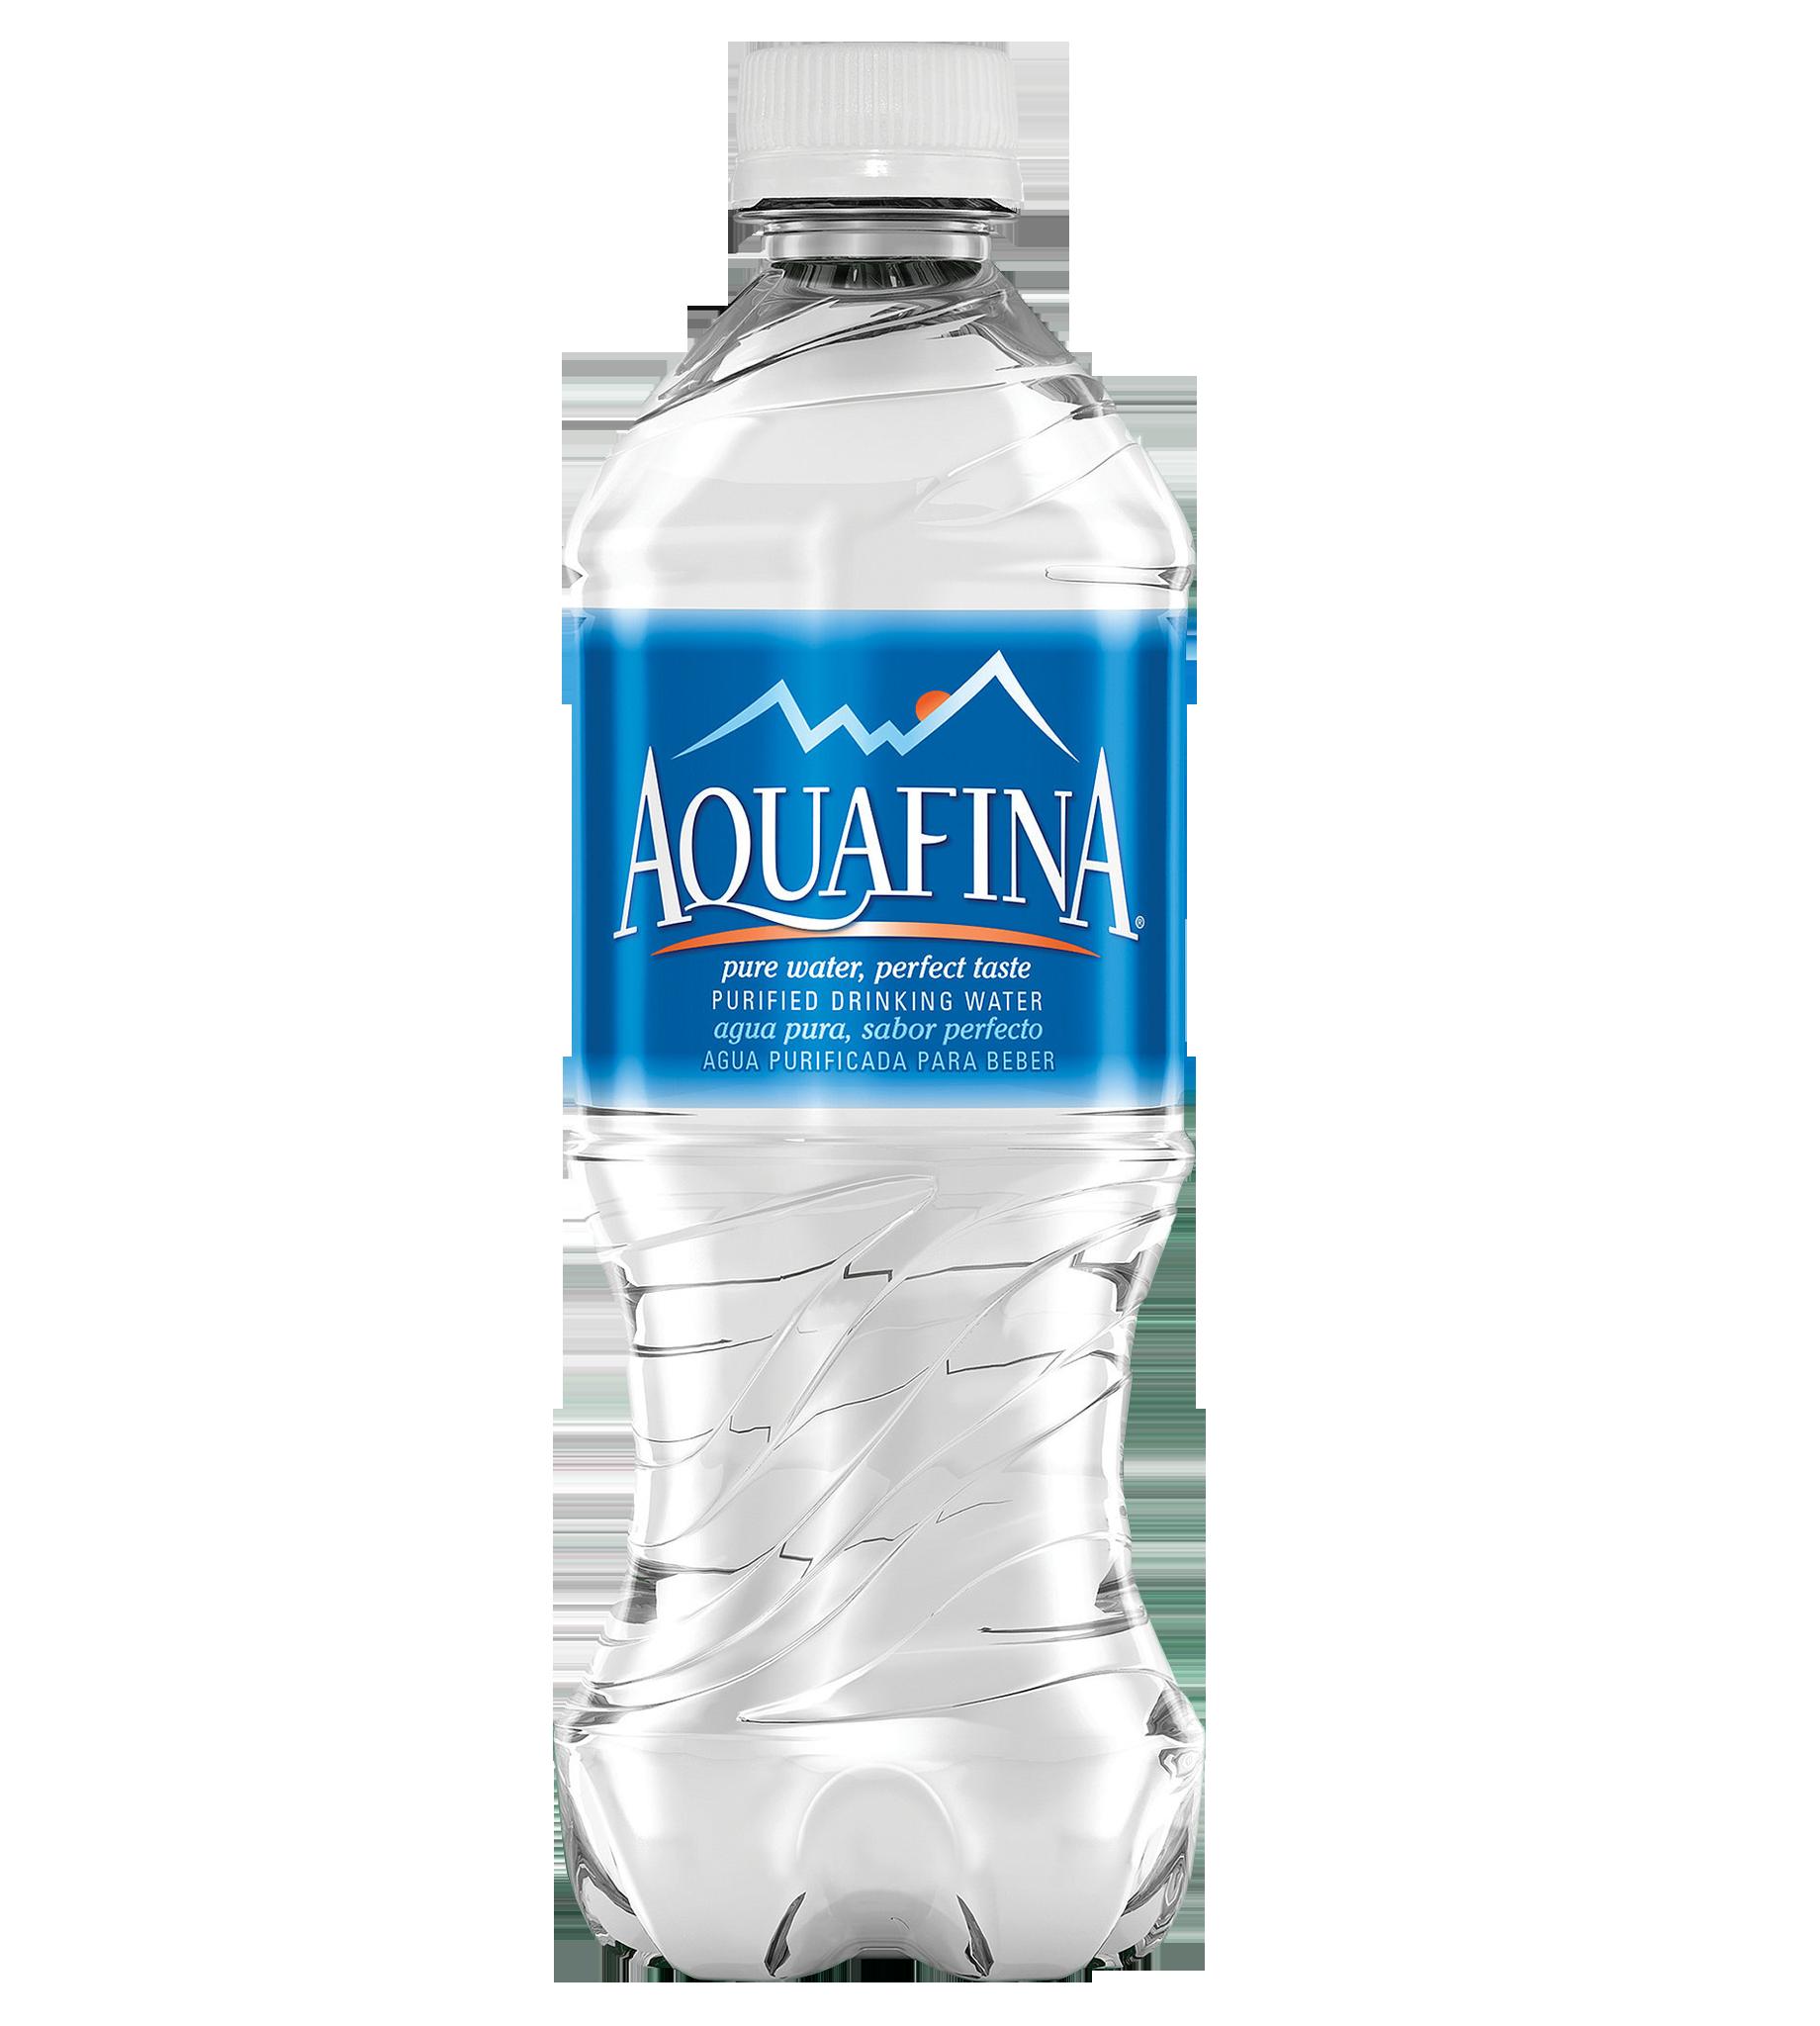 Bottle water png. Ice aquafina image purepng